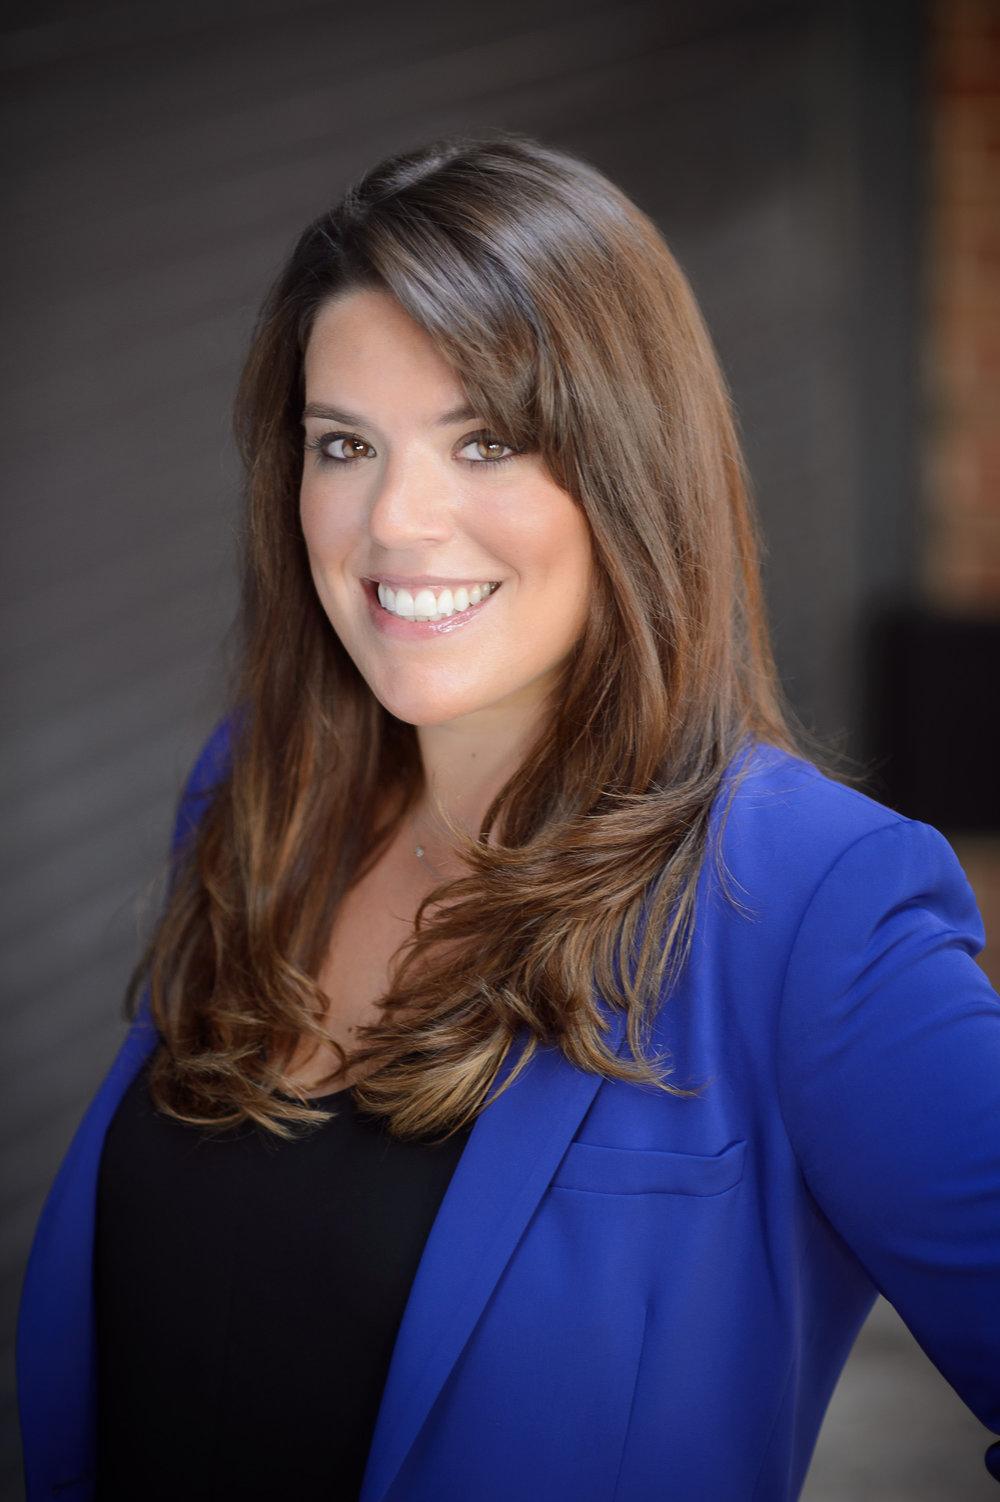 Elena Lipson, Principal and founder